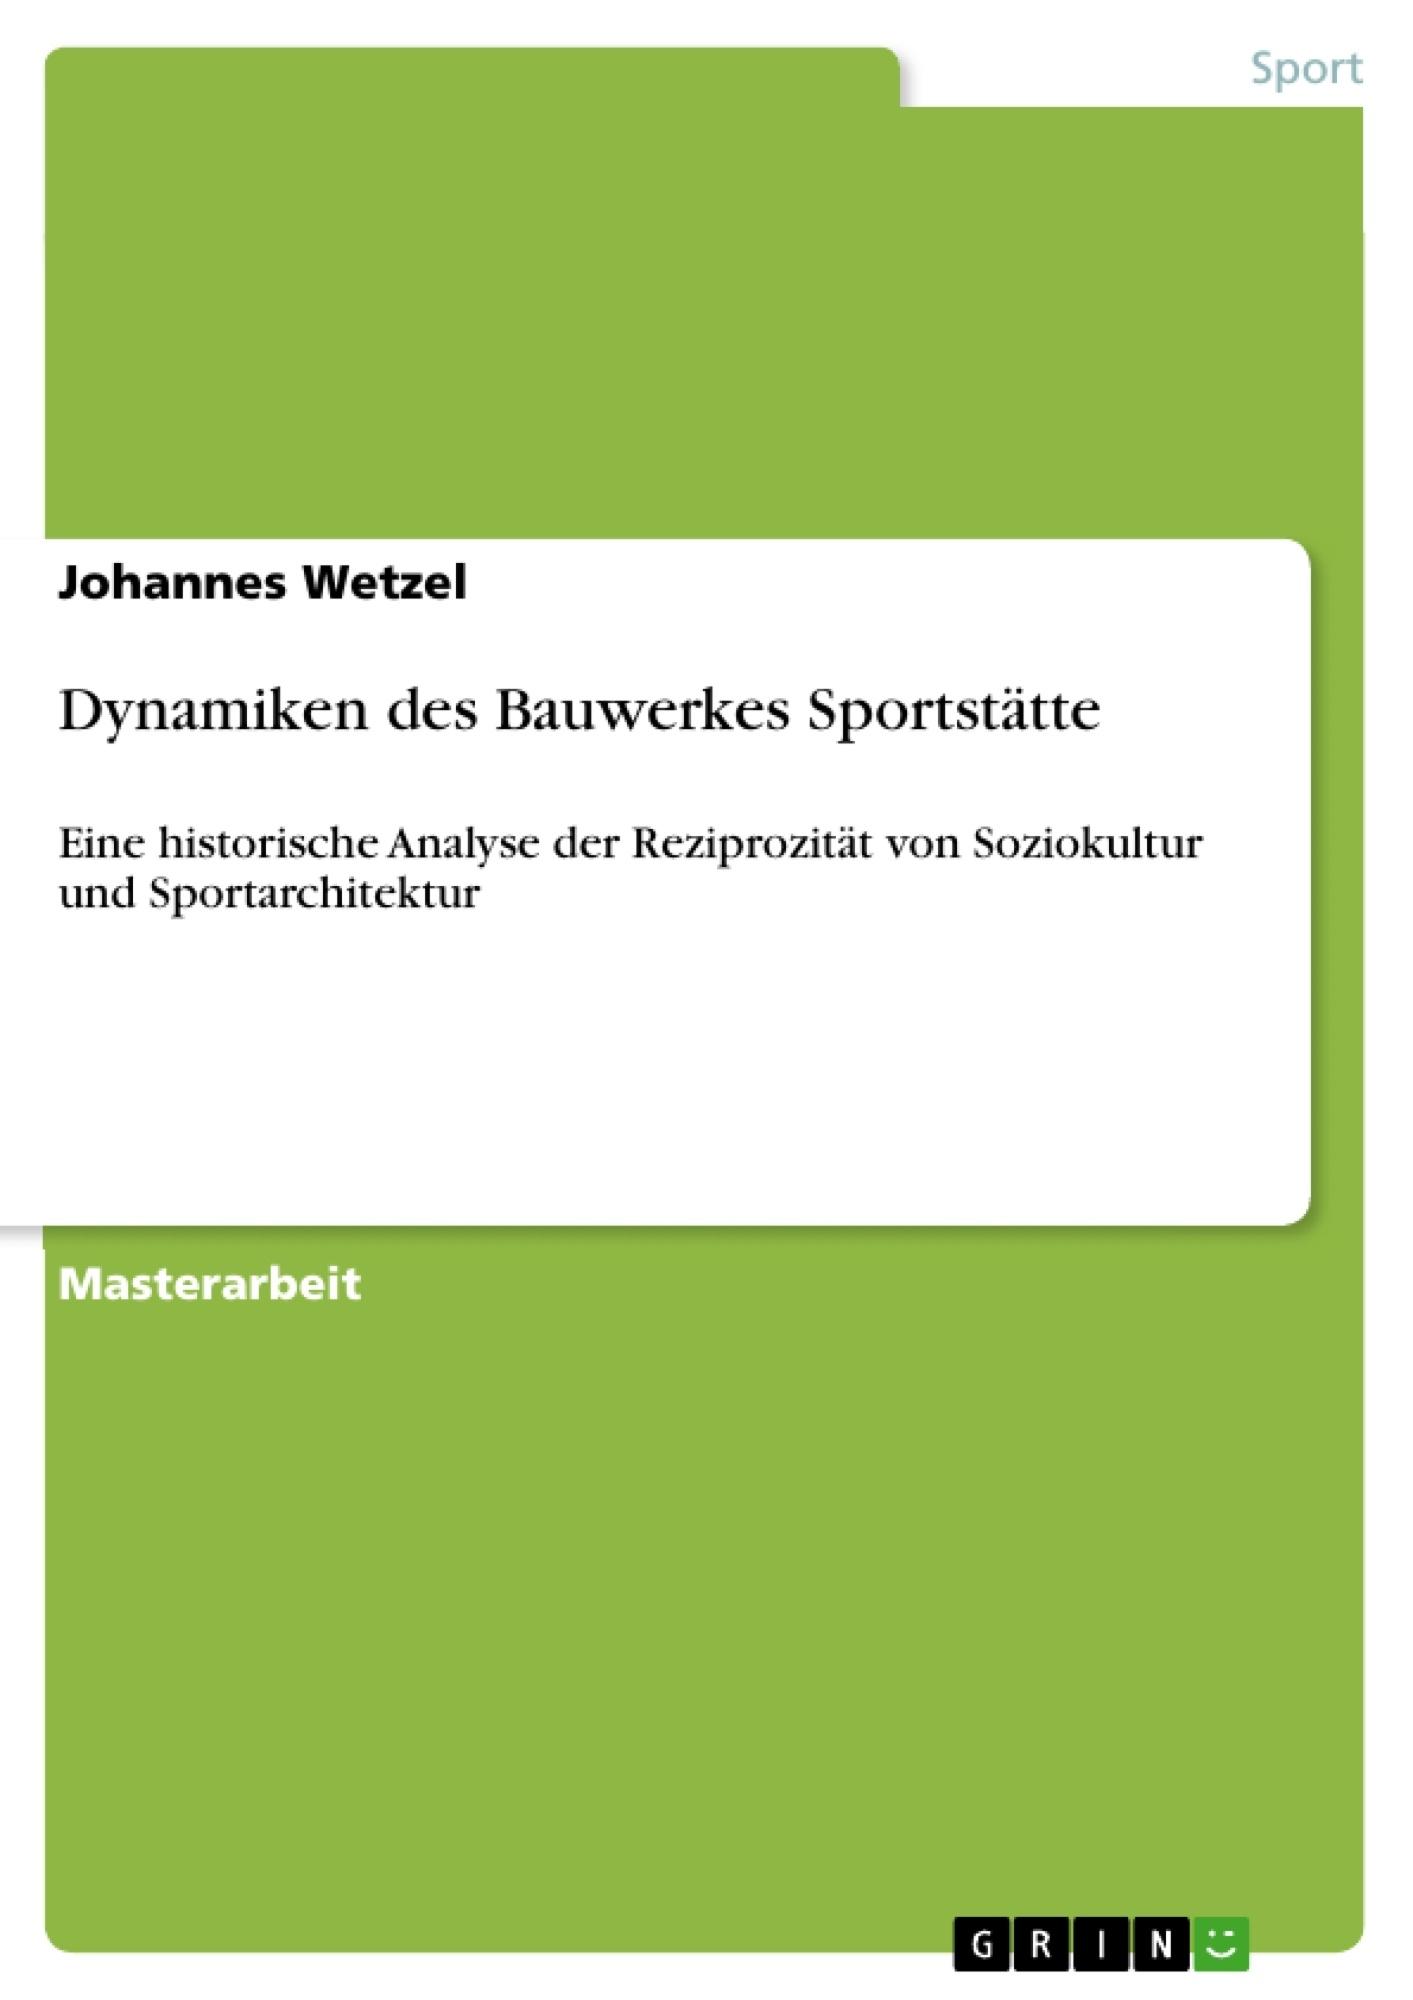 Titel: Dynamiken des Bauwerkes Sportstätte